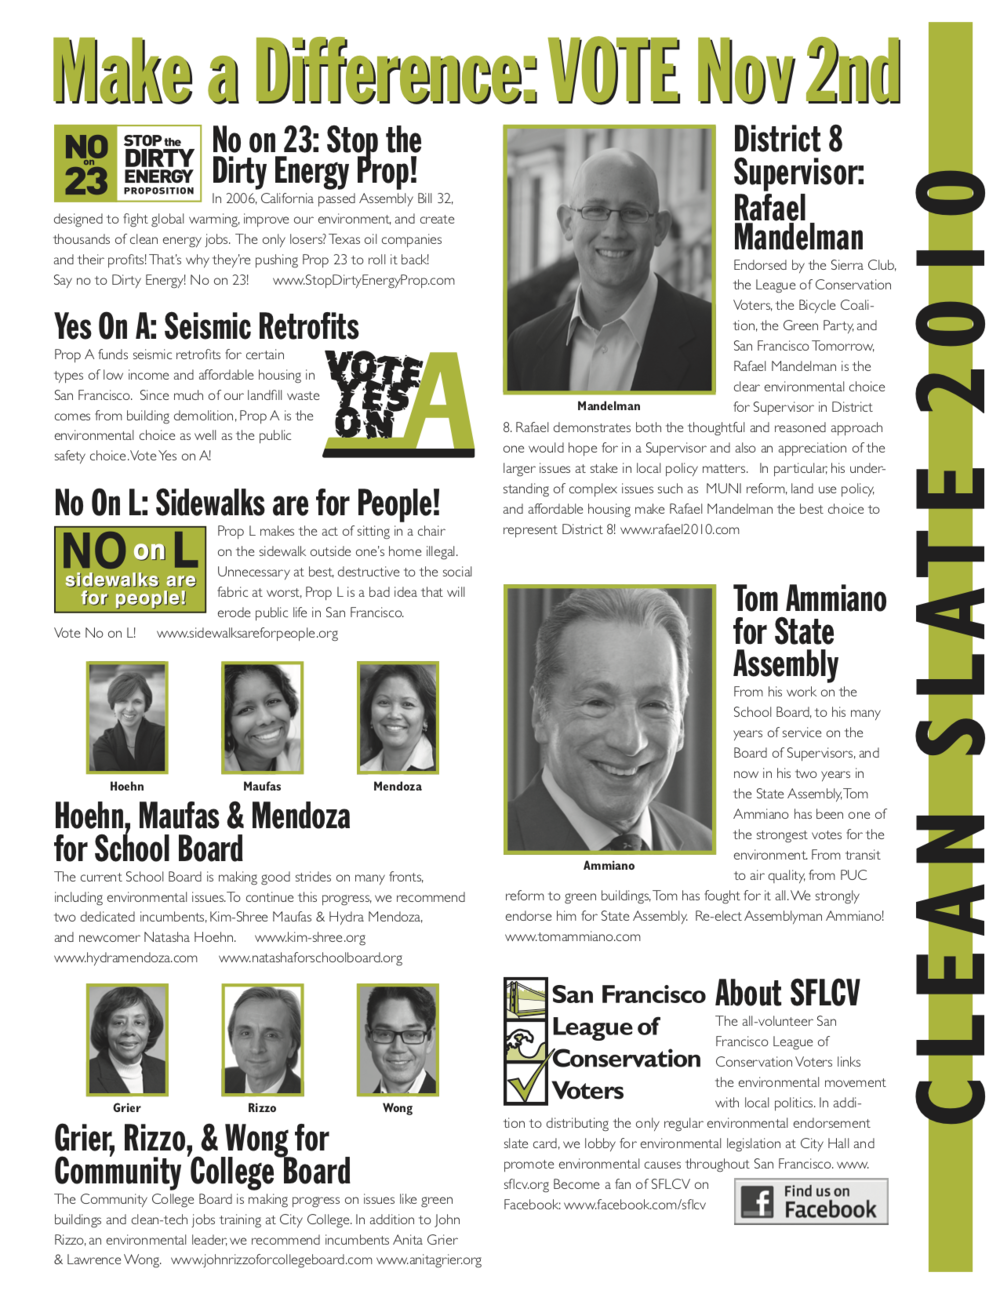 November 2010 District 8 SFLCV slater mailer